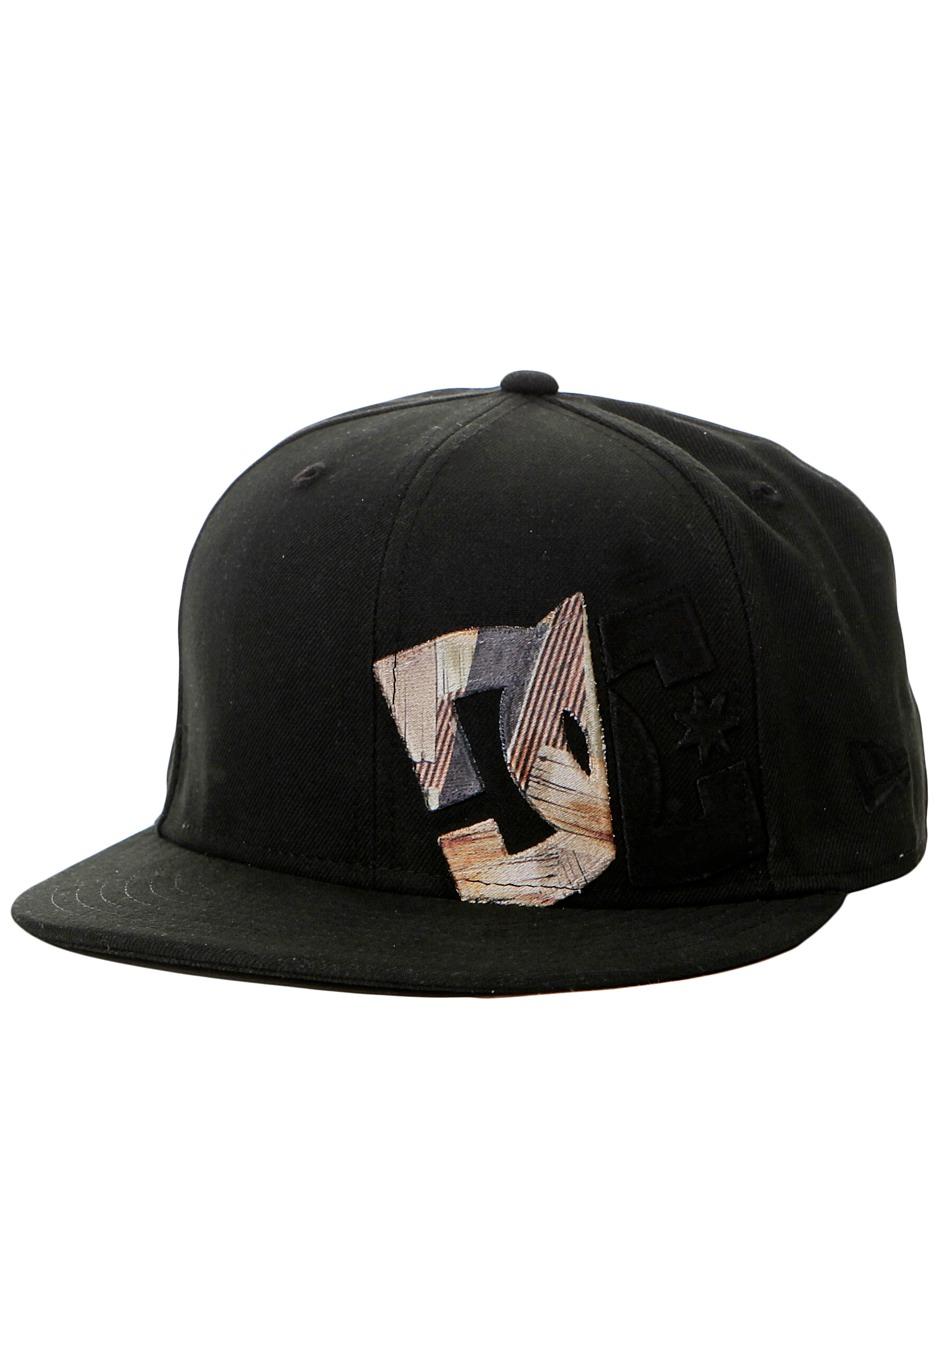 6573460d844 DC - TP Hills - Cap - Streetwear Shop - Impericon.com Worldwide